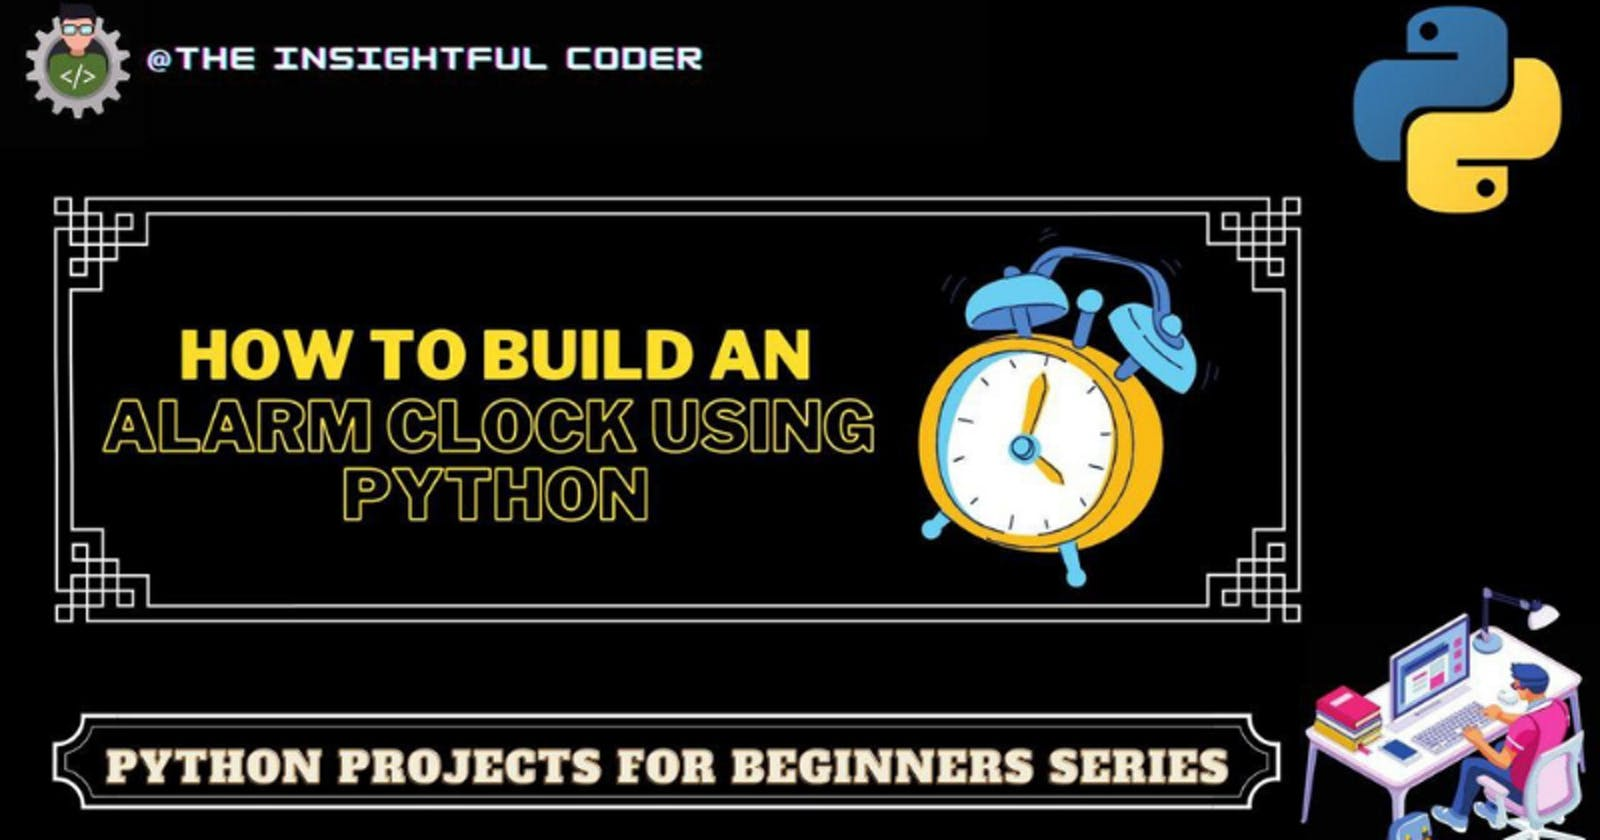 How to Build an Alarm Clock Using Python